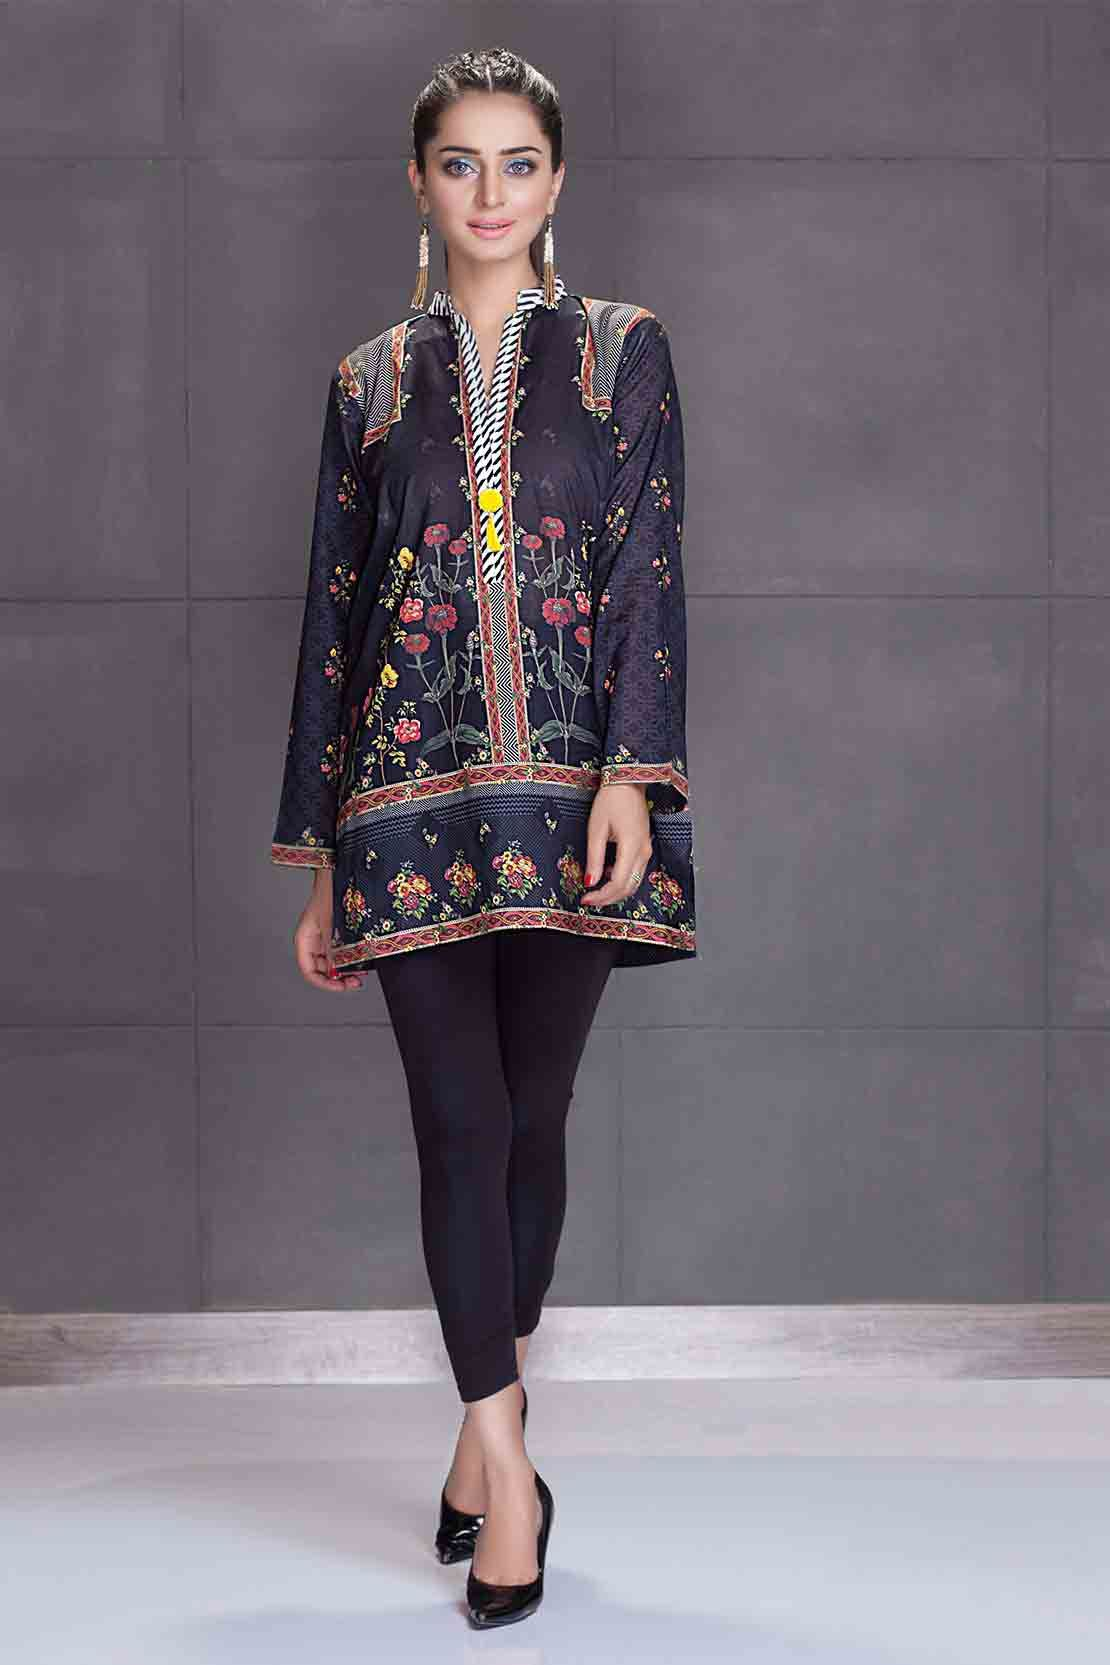 b02bd8cb4 Latest Pakistani Eid Dresses For Girls In 2019 in 2019